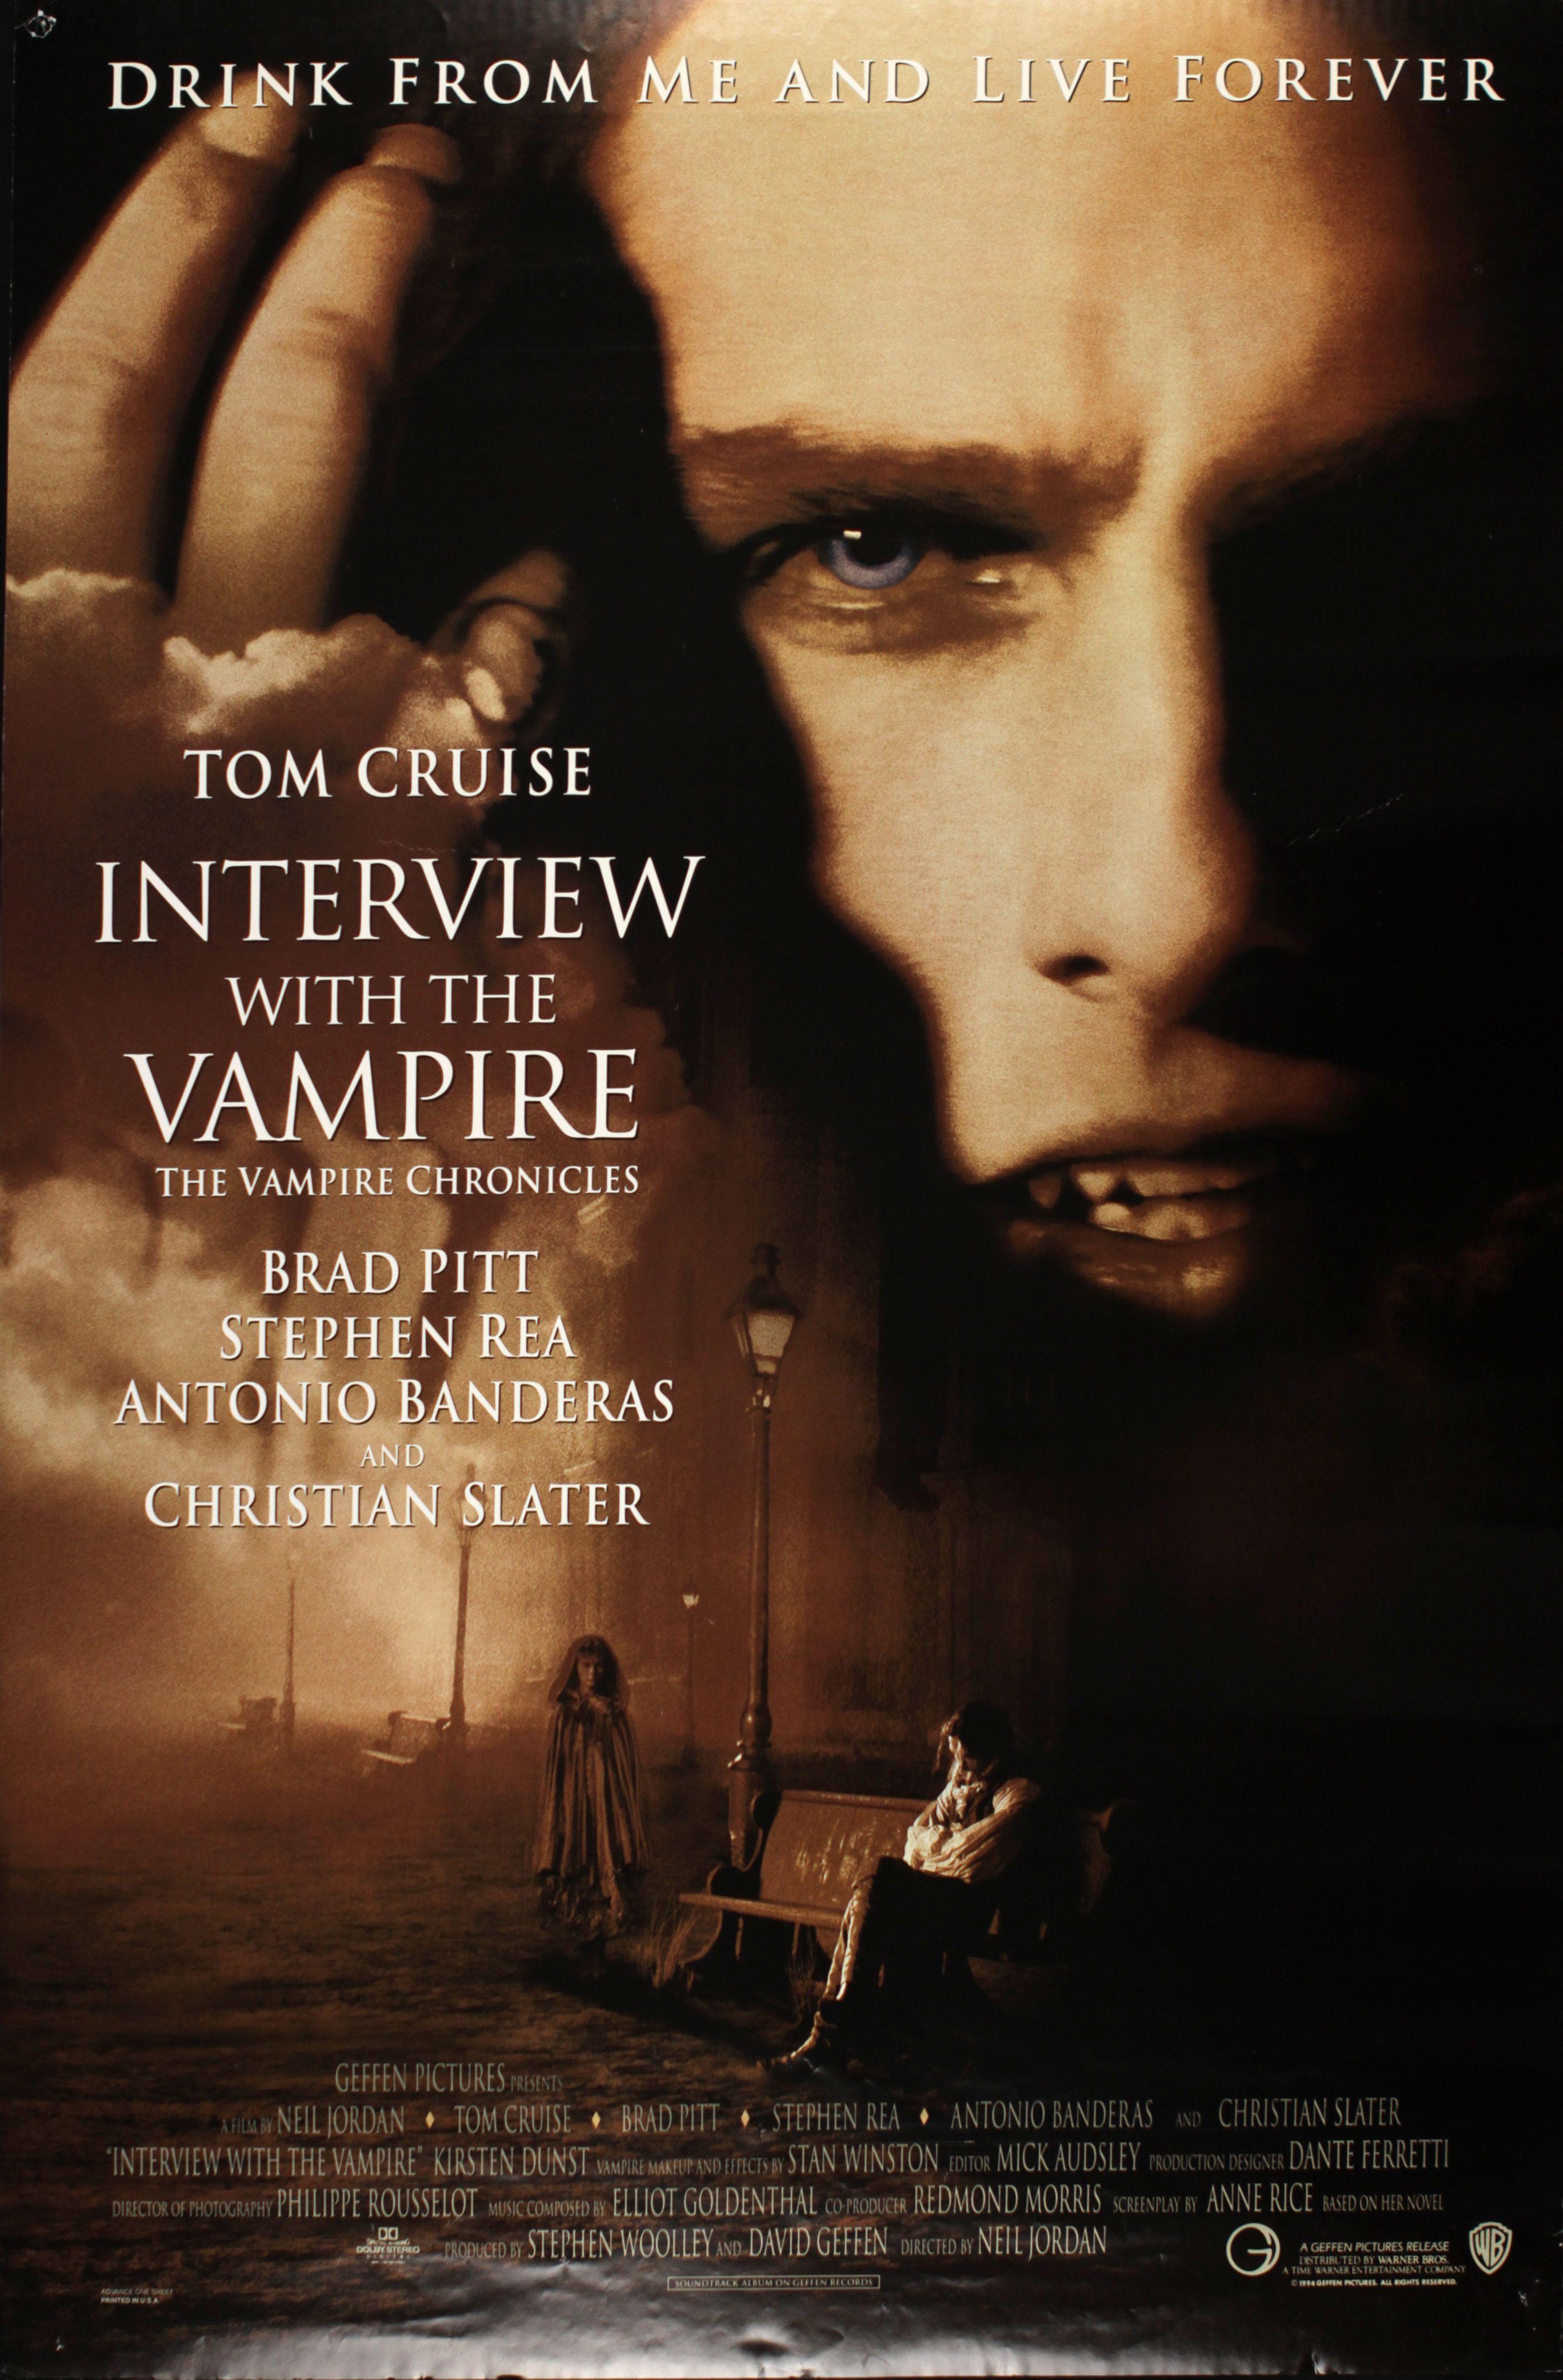 Movie Poster Film Book Com Vampire Film Interview With The Vampire Vampire Movies